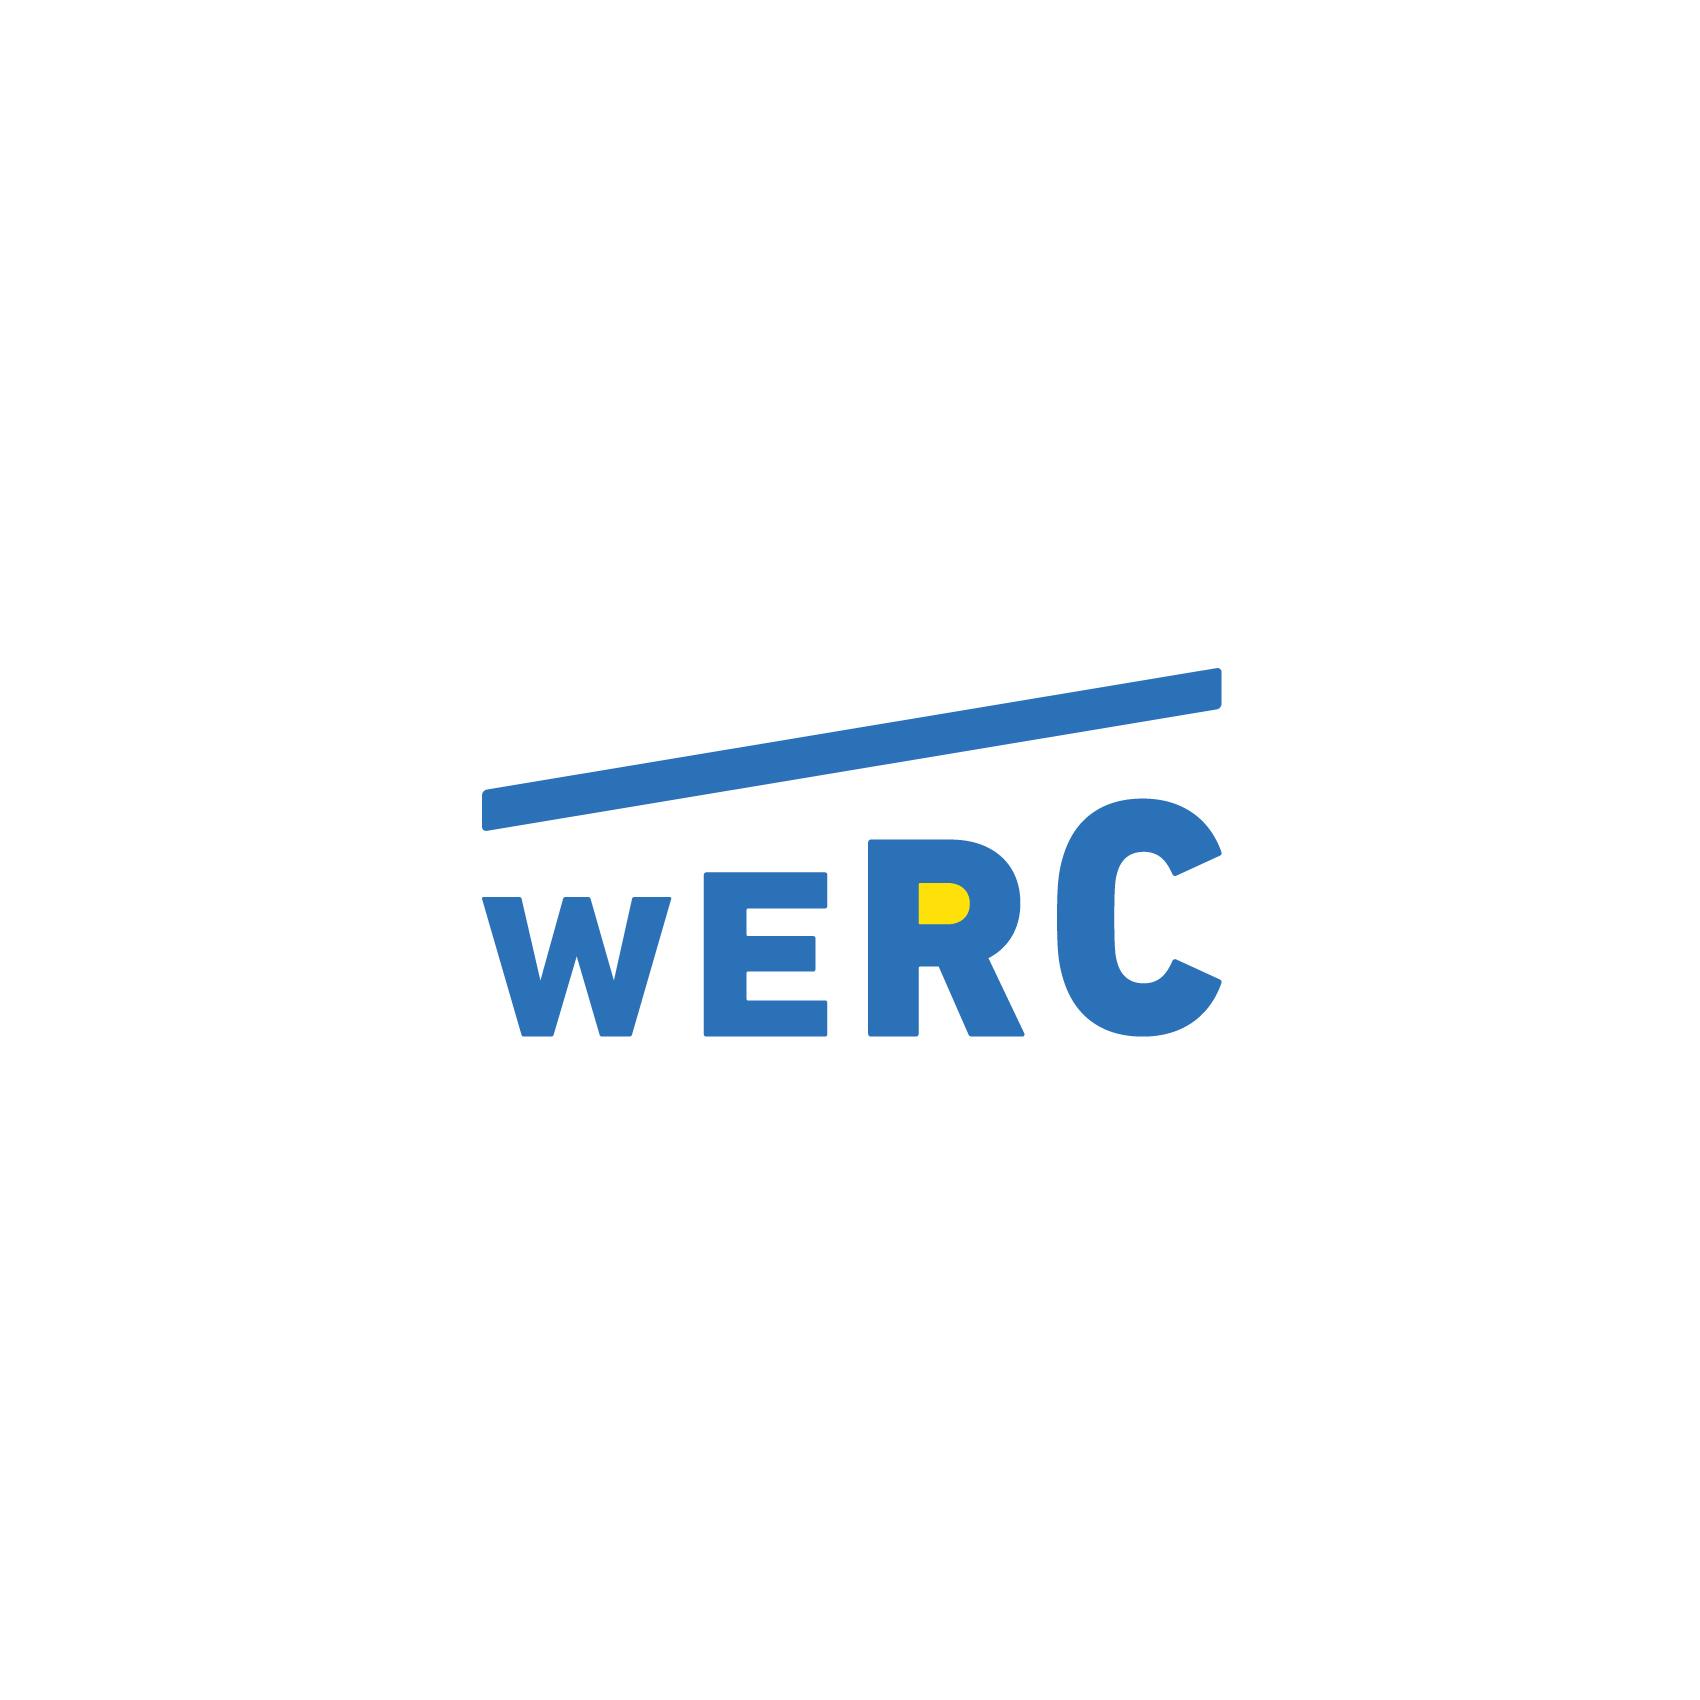 WERC Corporation|CIロゴデザイン グラフィックデザイン ブランドデザイン パンフレットデザイン|千葉県松戸市